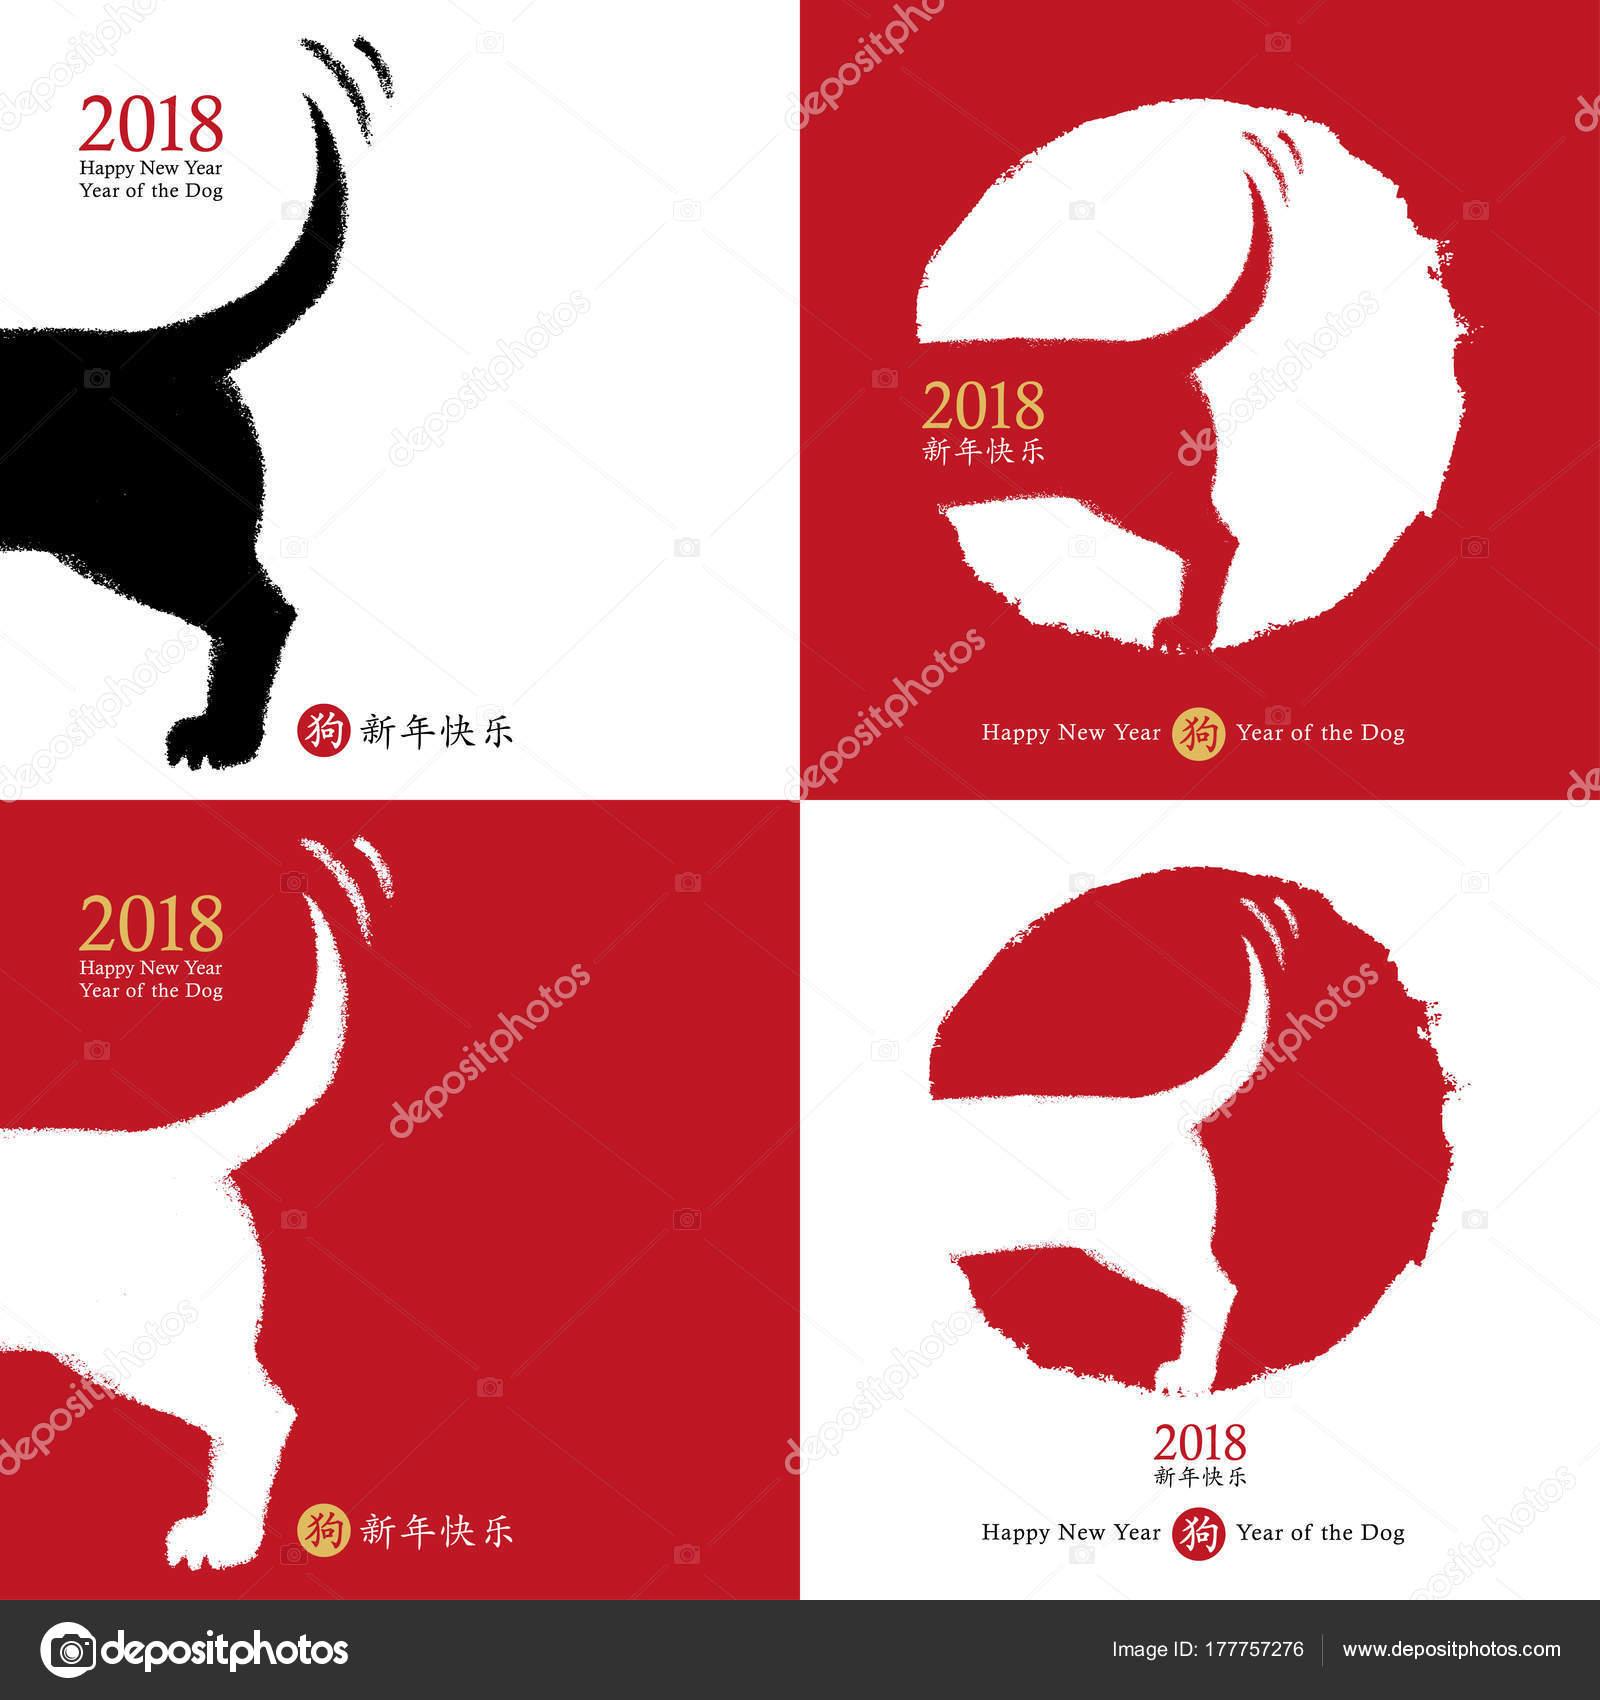 2018 Chinese New Year of the Dog Bühnenbild Vektor Karte ...